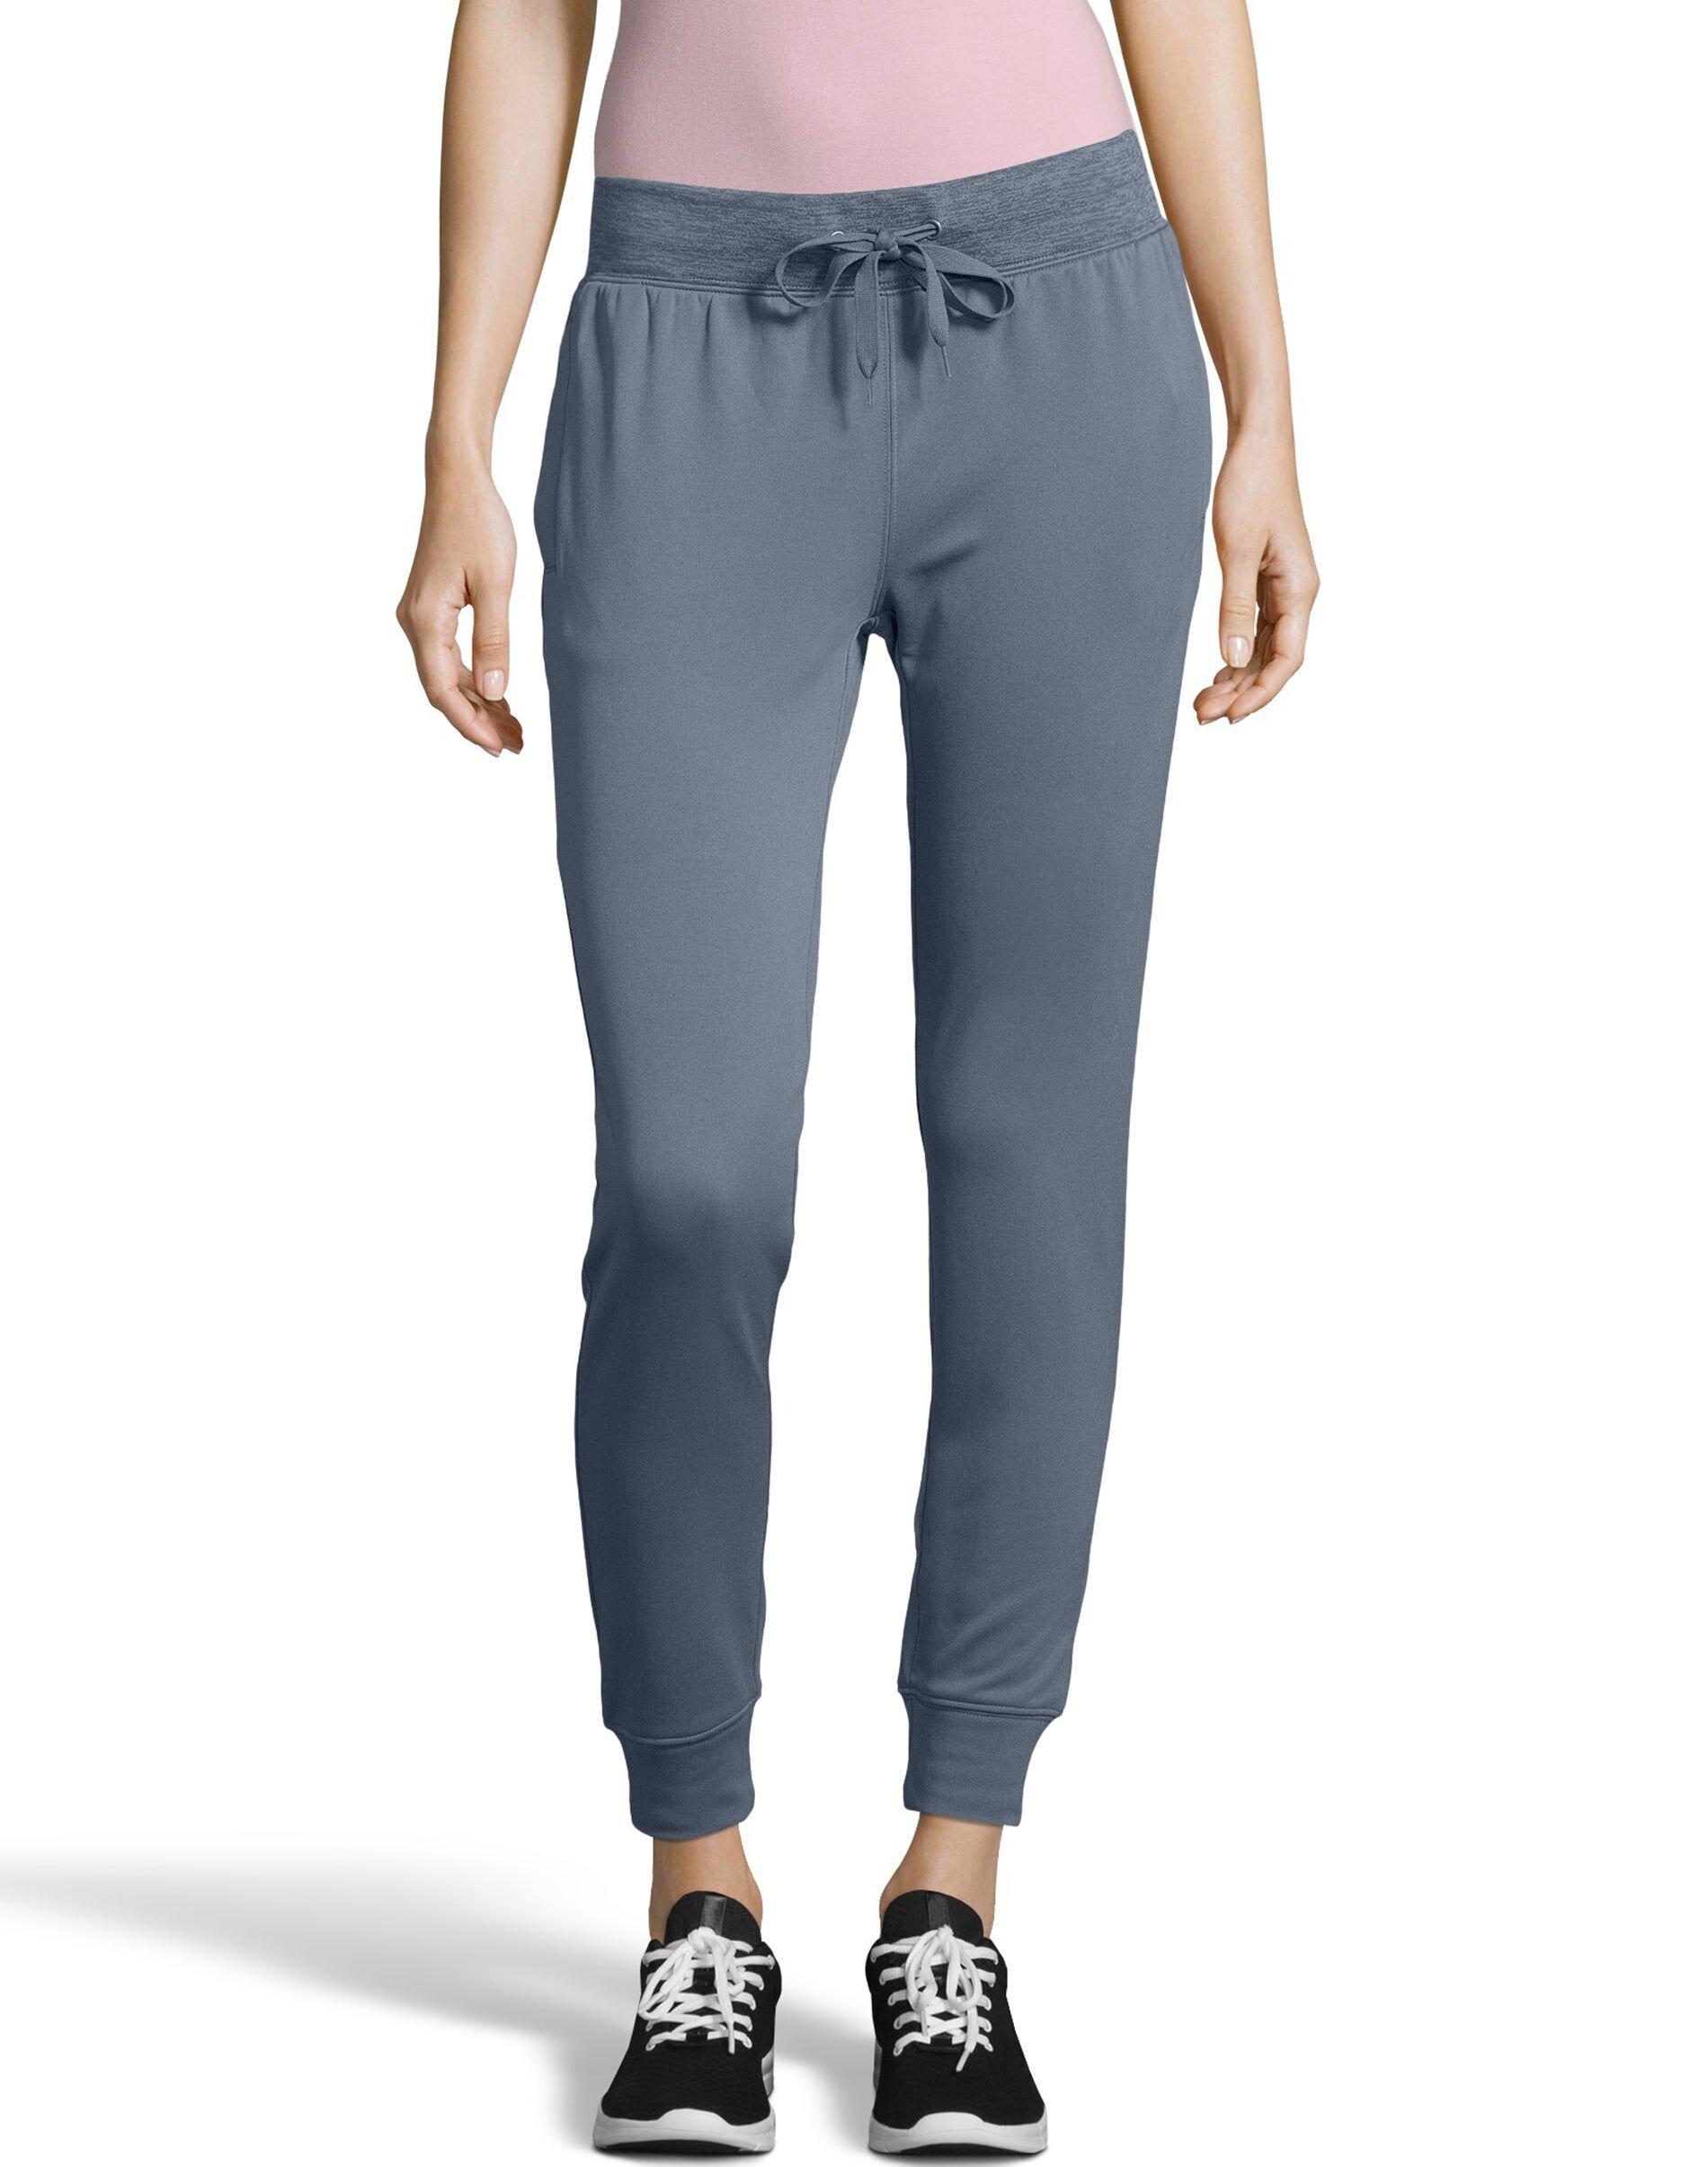 Hanes Sport Women's Performance Fleece Jogger Pants With Pockets Dada Grey/Dada Grey Heather XL